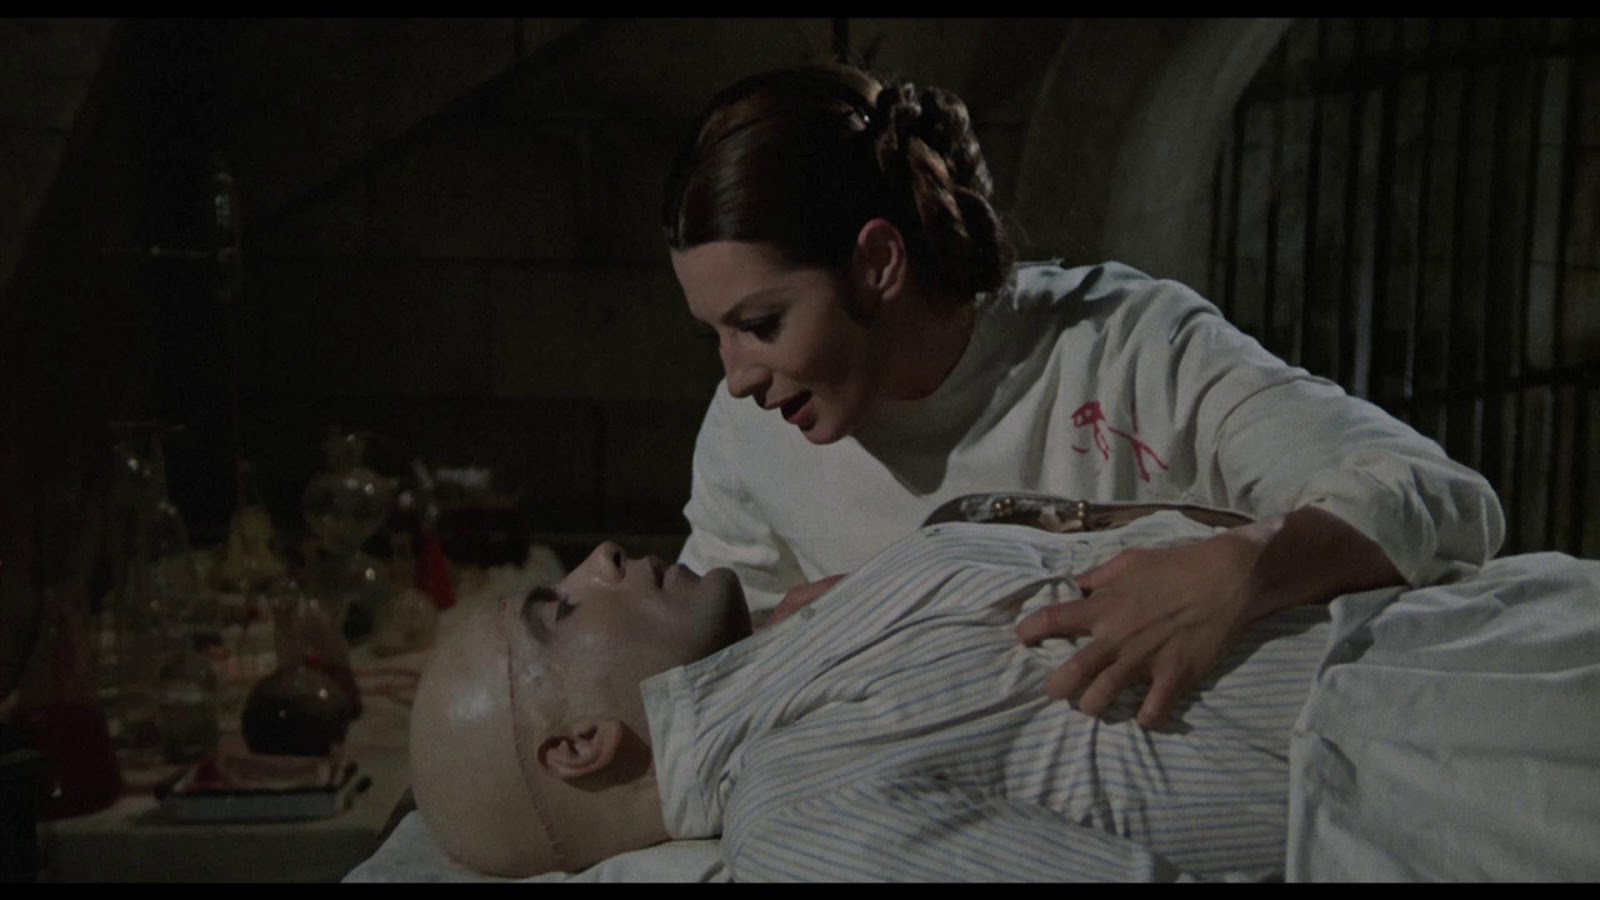 Films in London this week: LADY FRANKENSTEIN at The King & Queen (09 NOV).